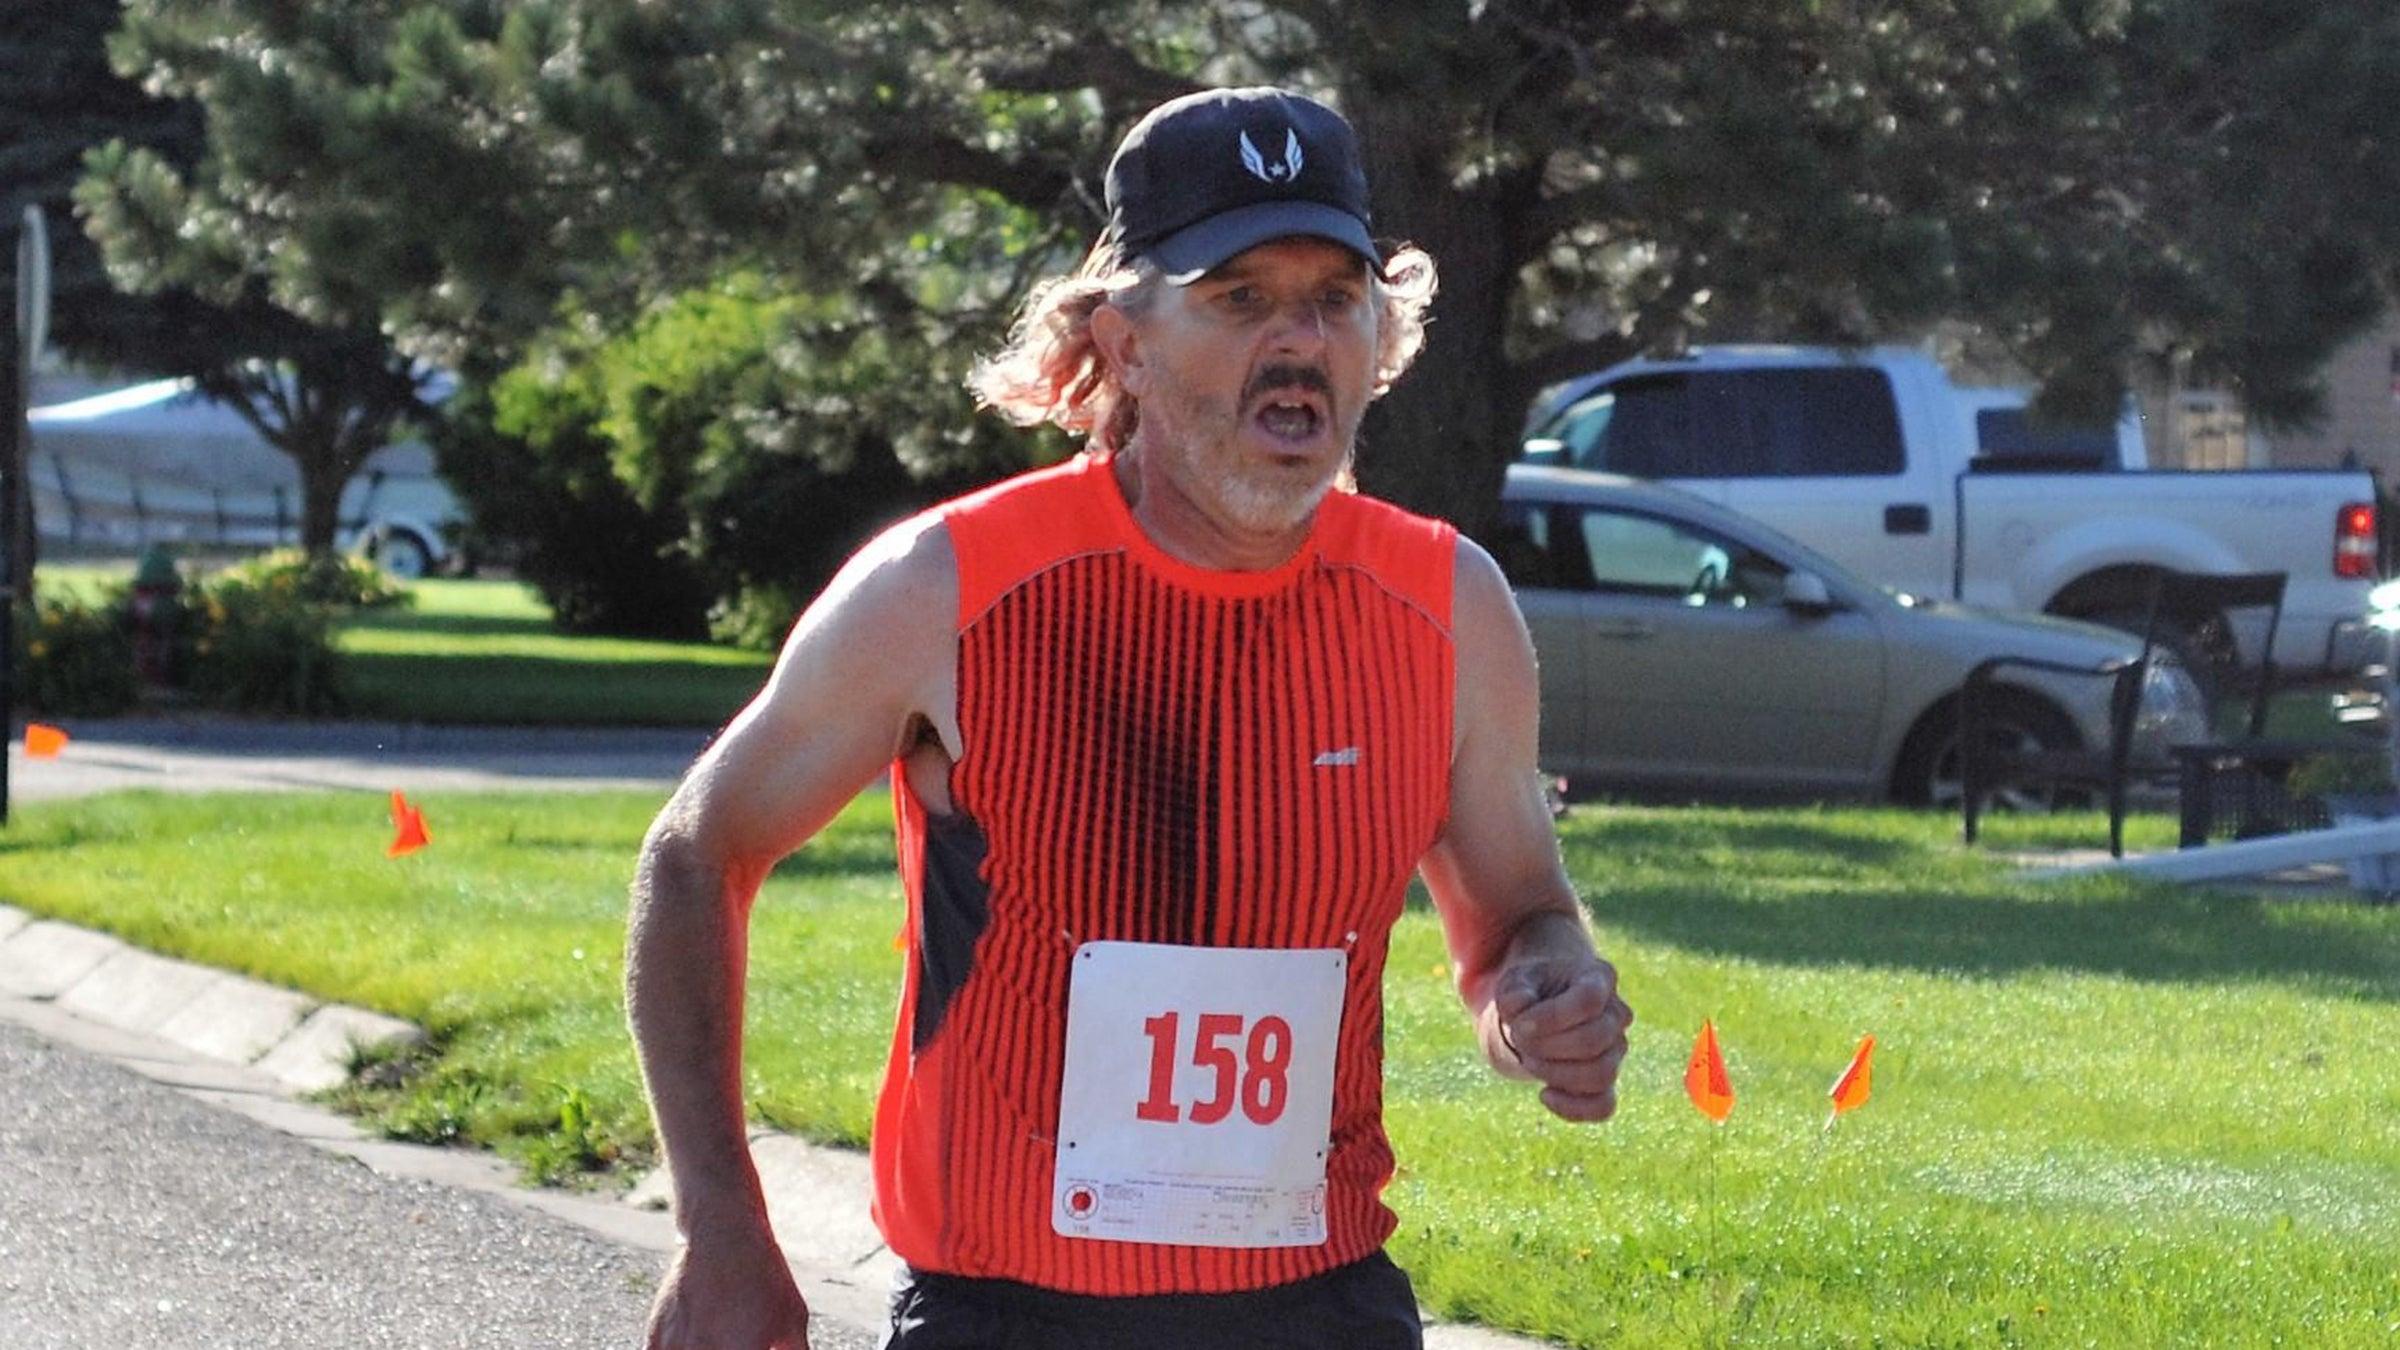 man straining in race